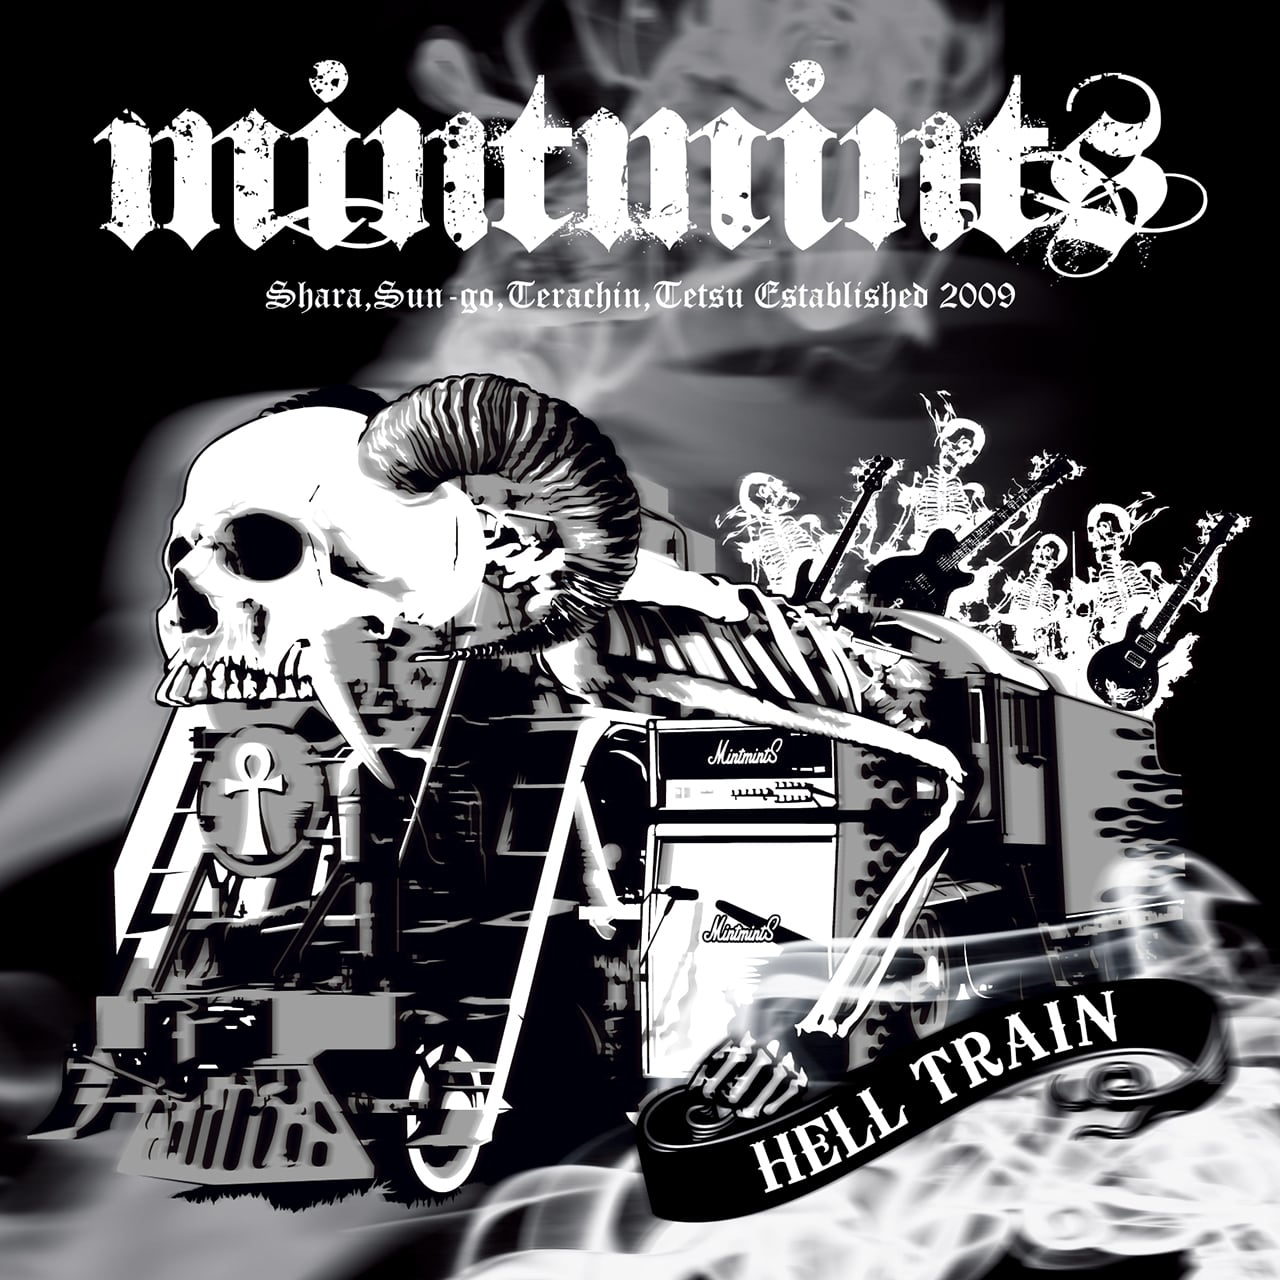 CD+DVD:『HELLTRAIN』mintmints(ミントミンツ) +特典付 - 画像1